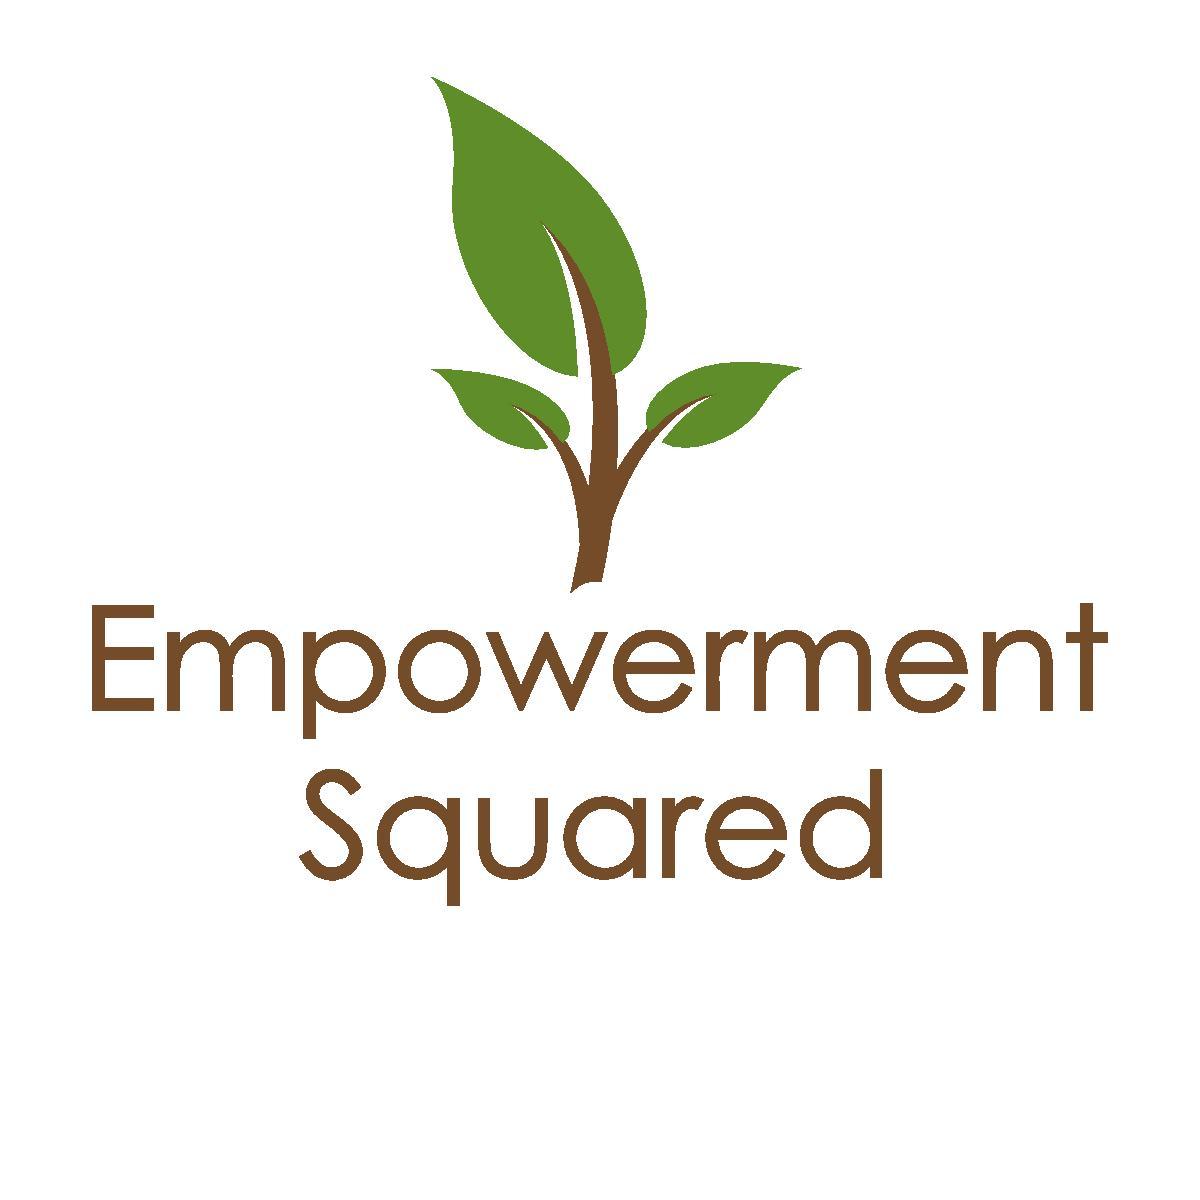 Empowerment Squared Logo (4)-page-001.jpg